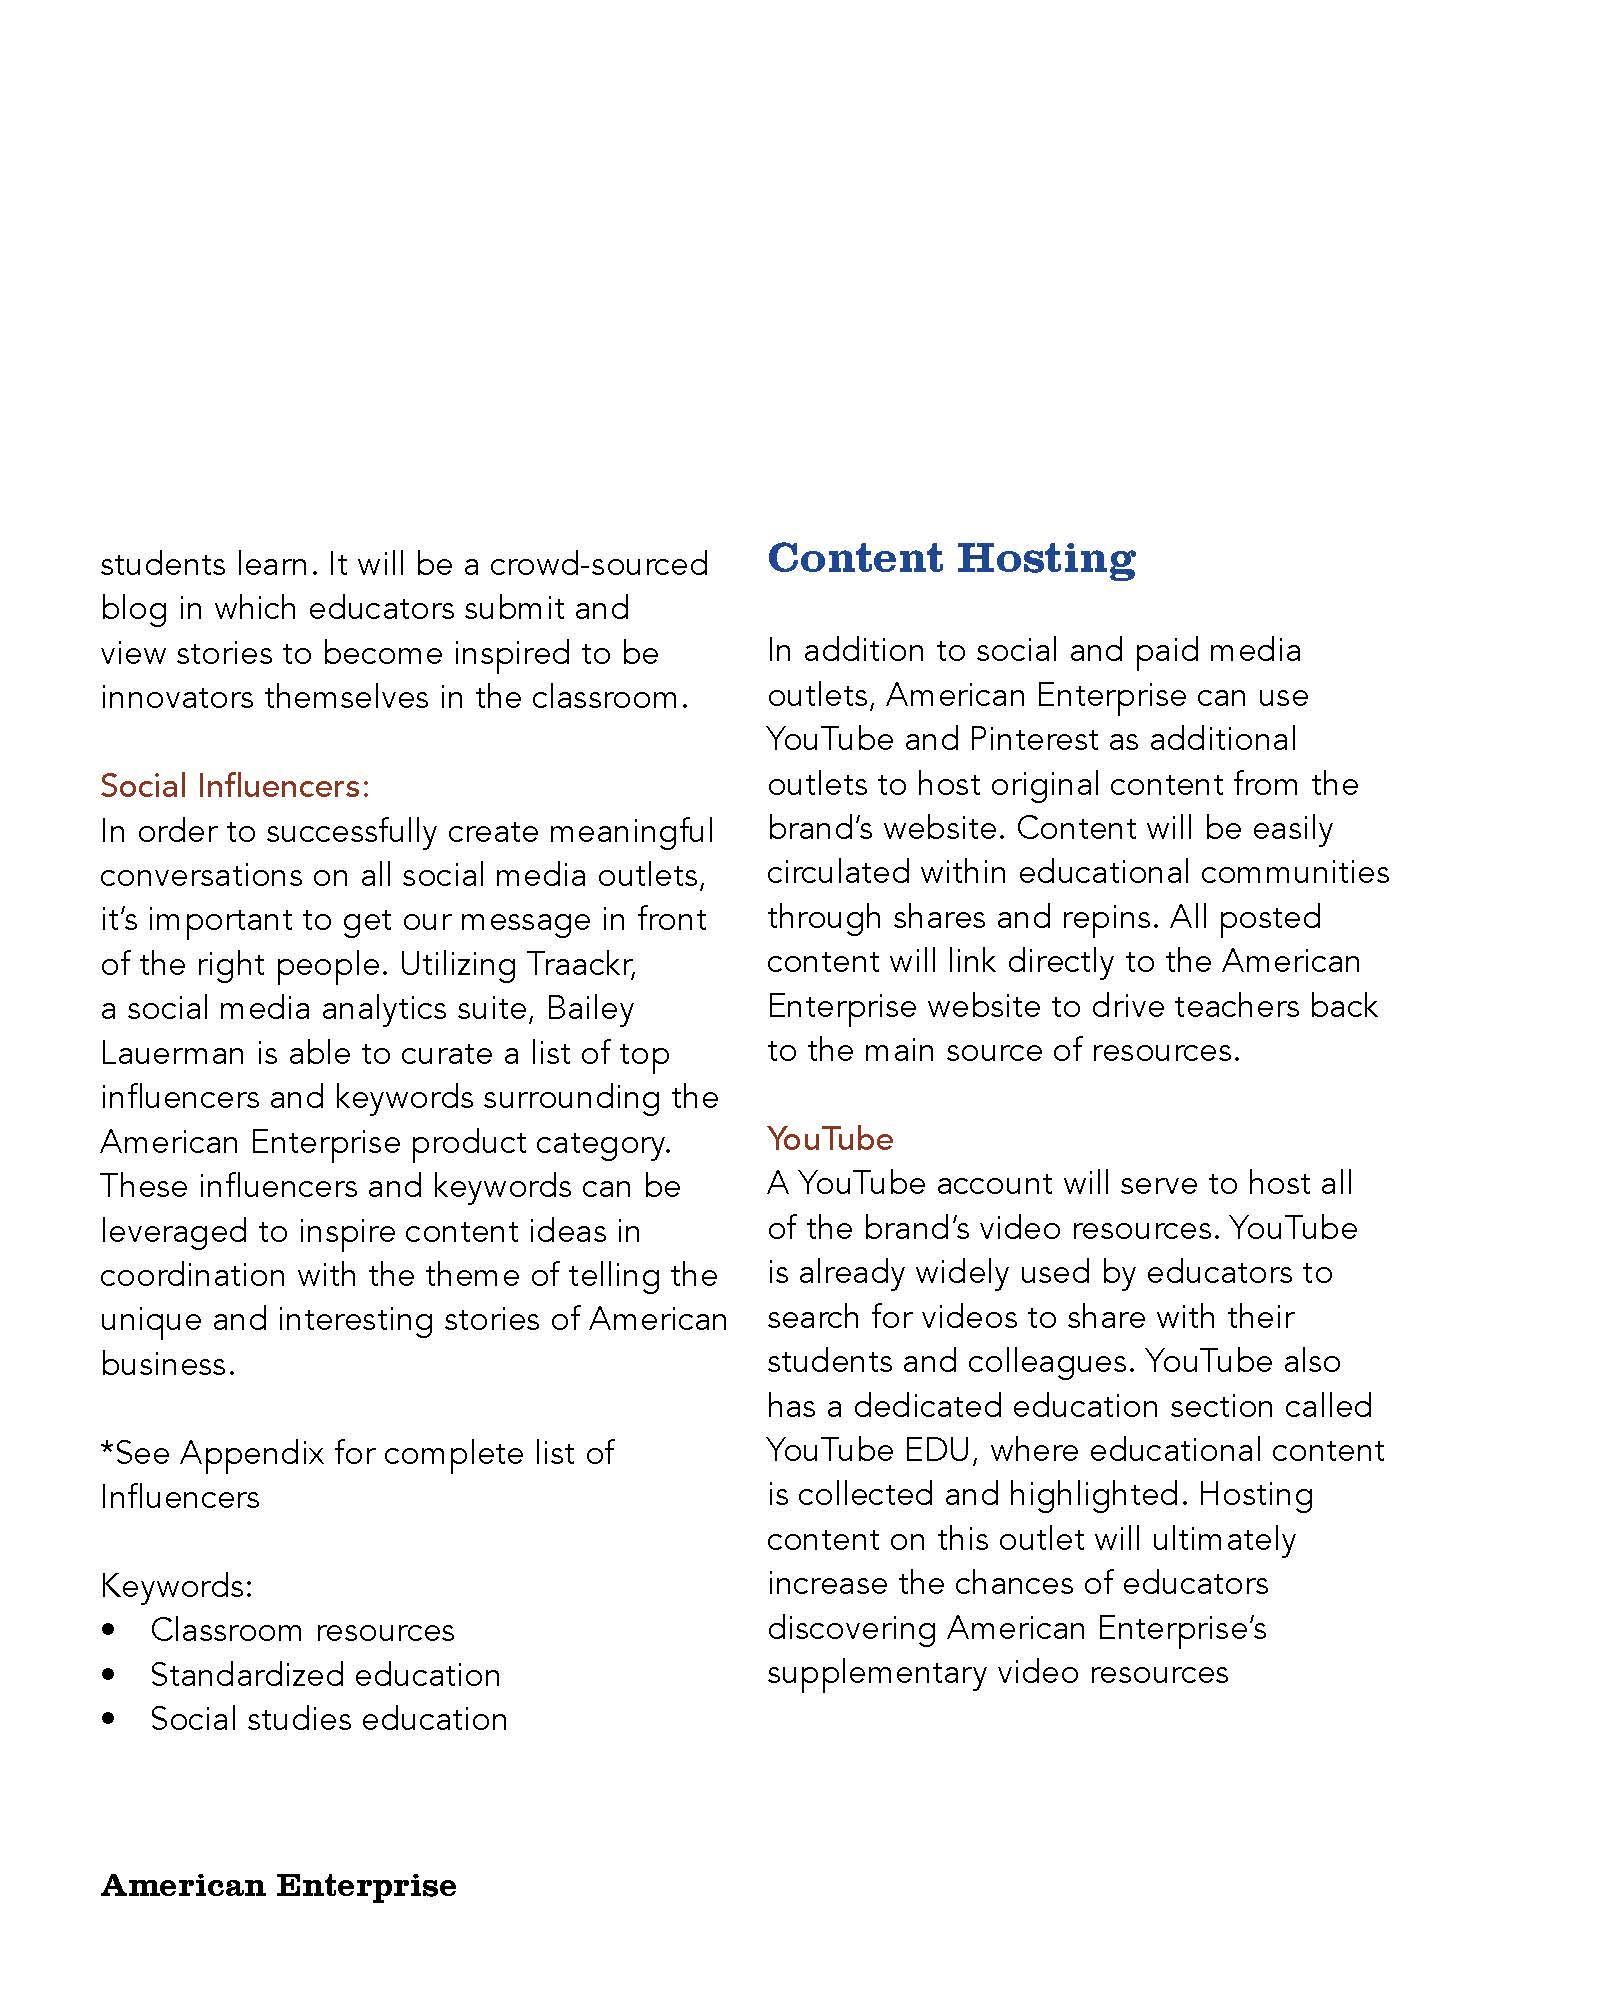 American Enterprise Plans Book%2C 2013%28cut%29_Page_44.jpg